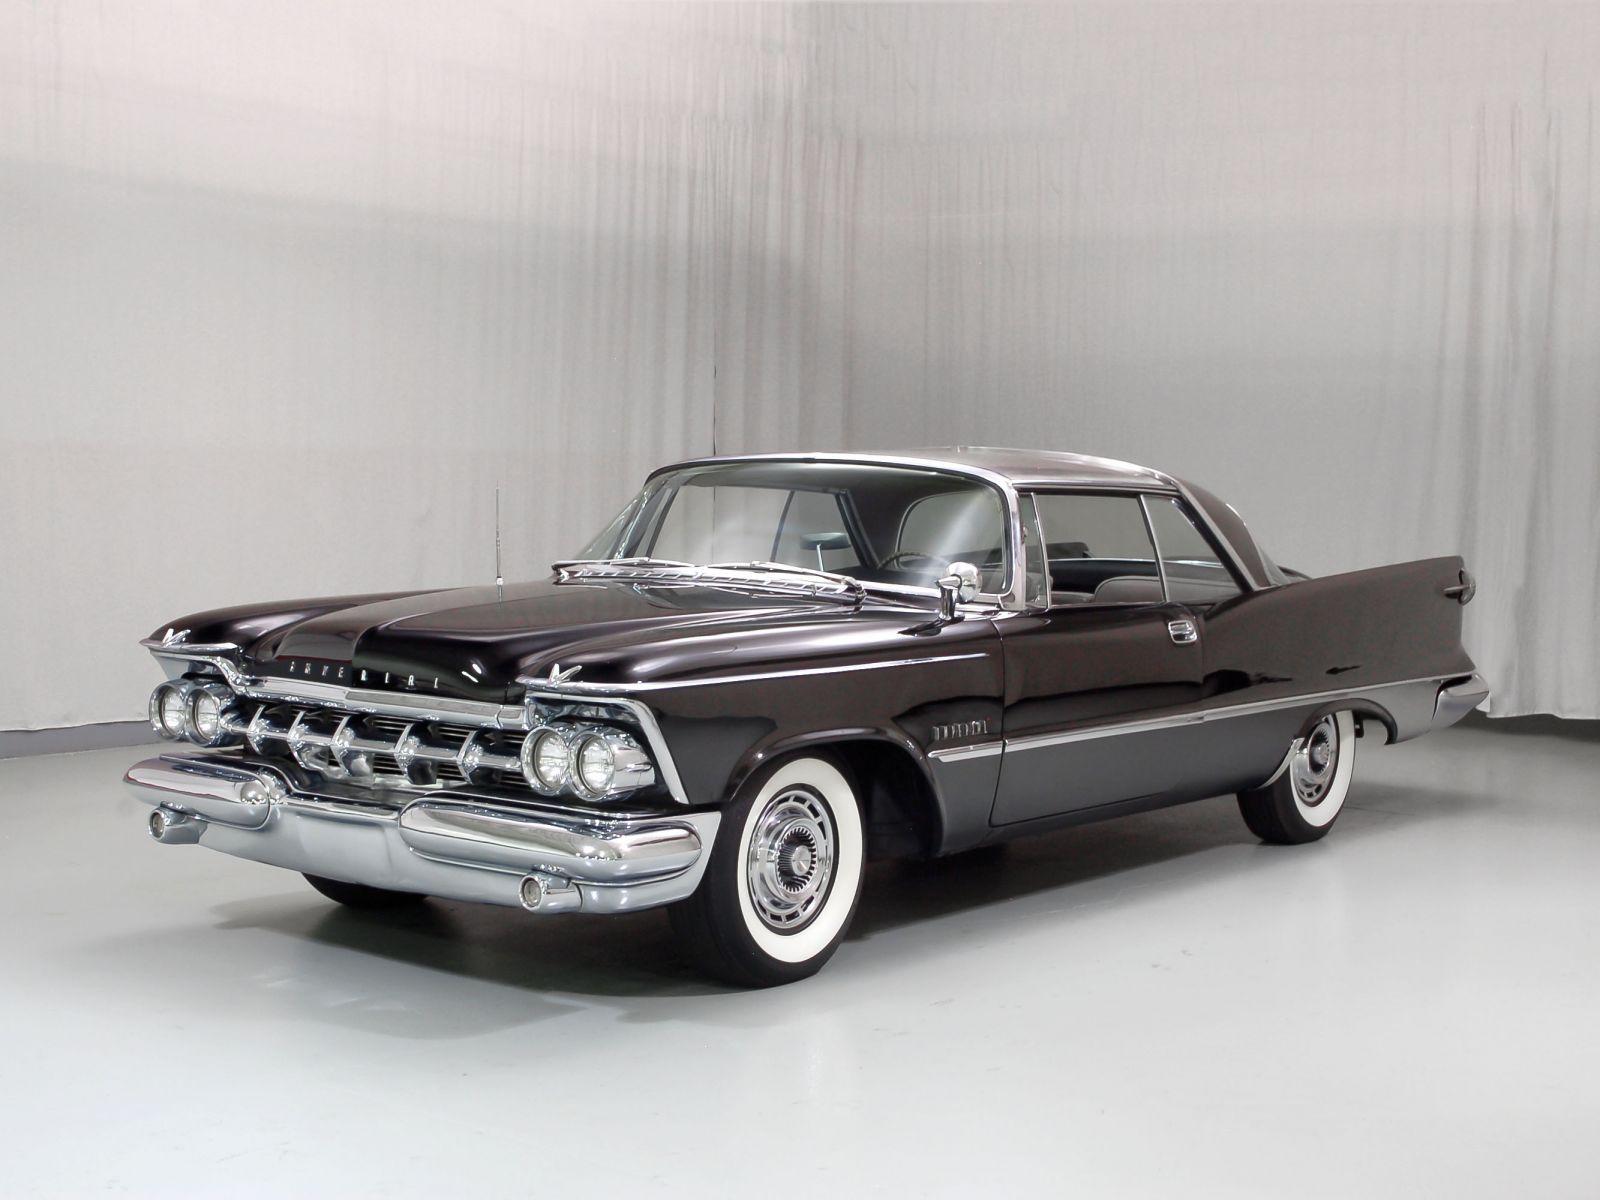 1959 Chrysler Imperial South Hampton Coupe - Hyman Ltd. Classic Cars ...